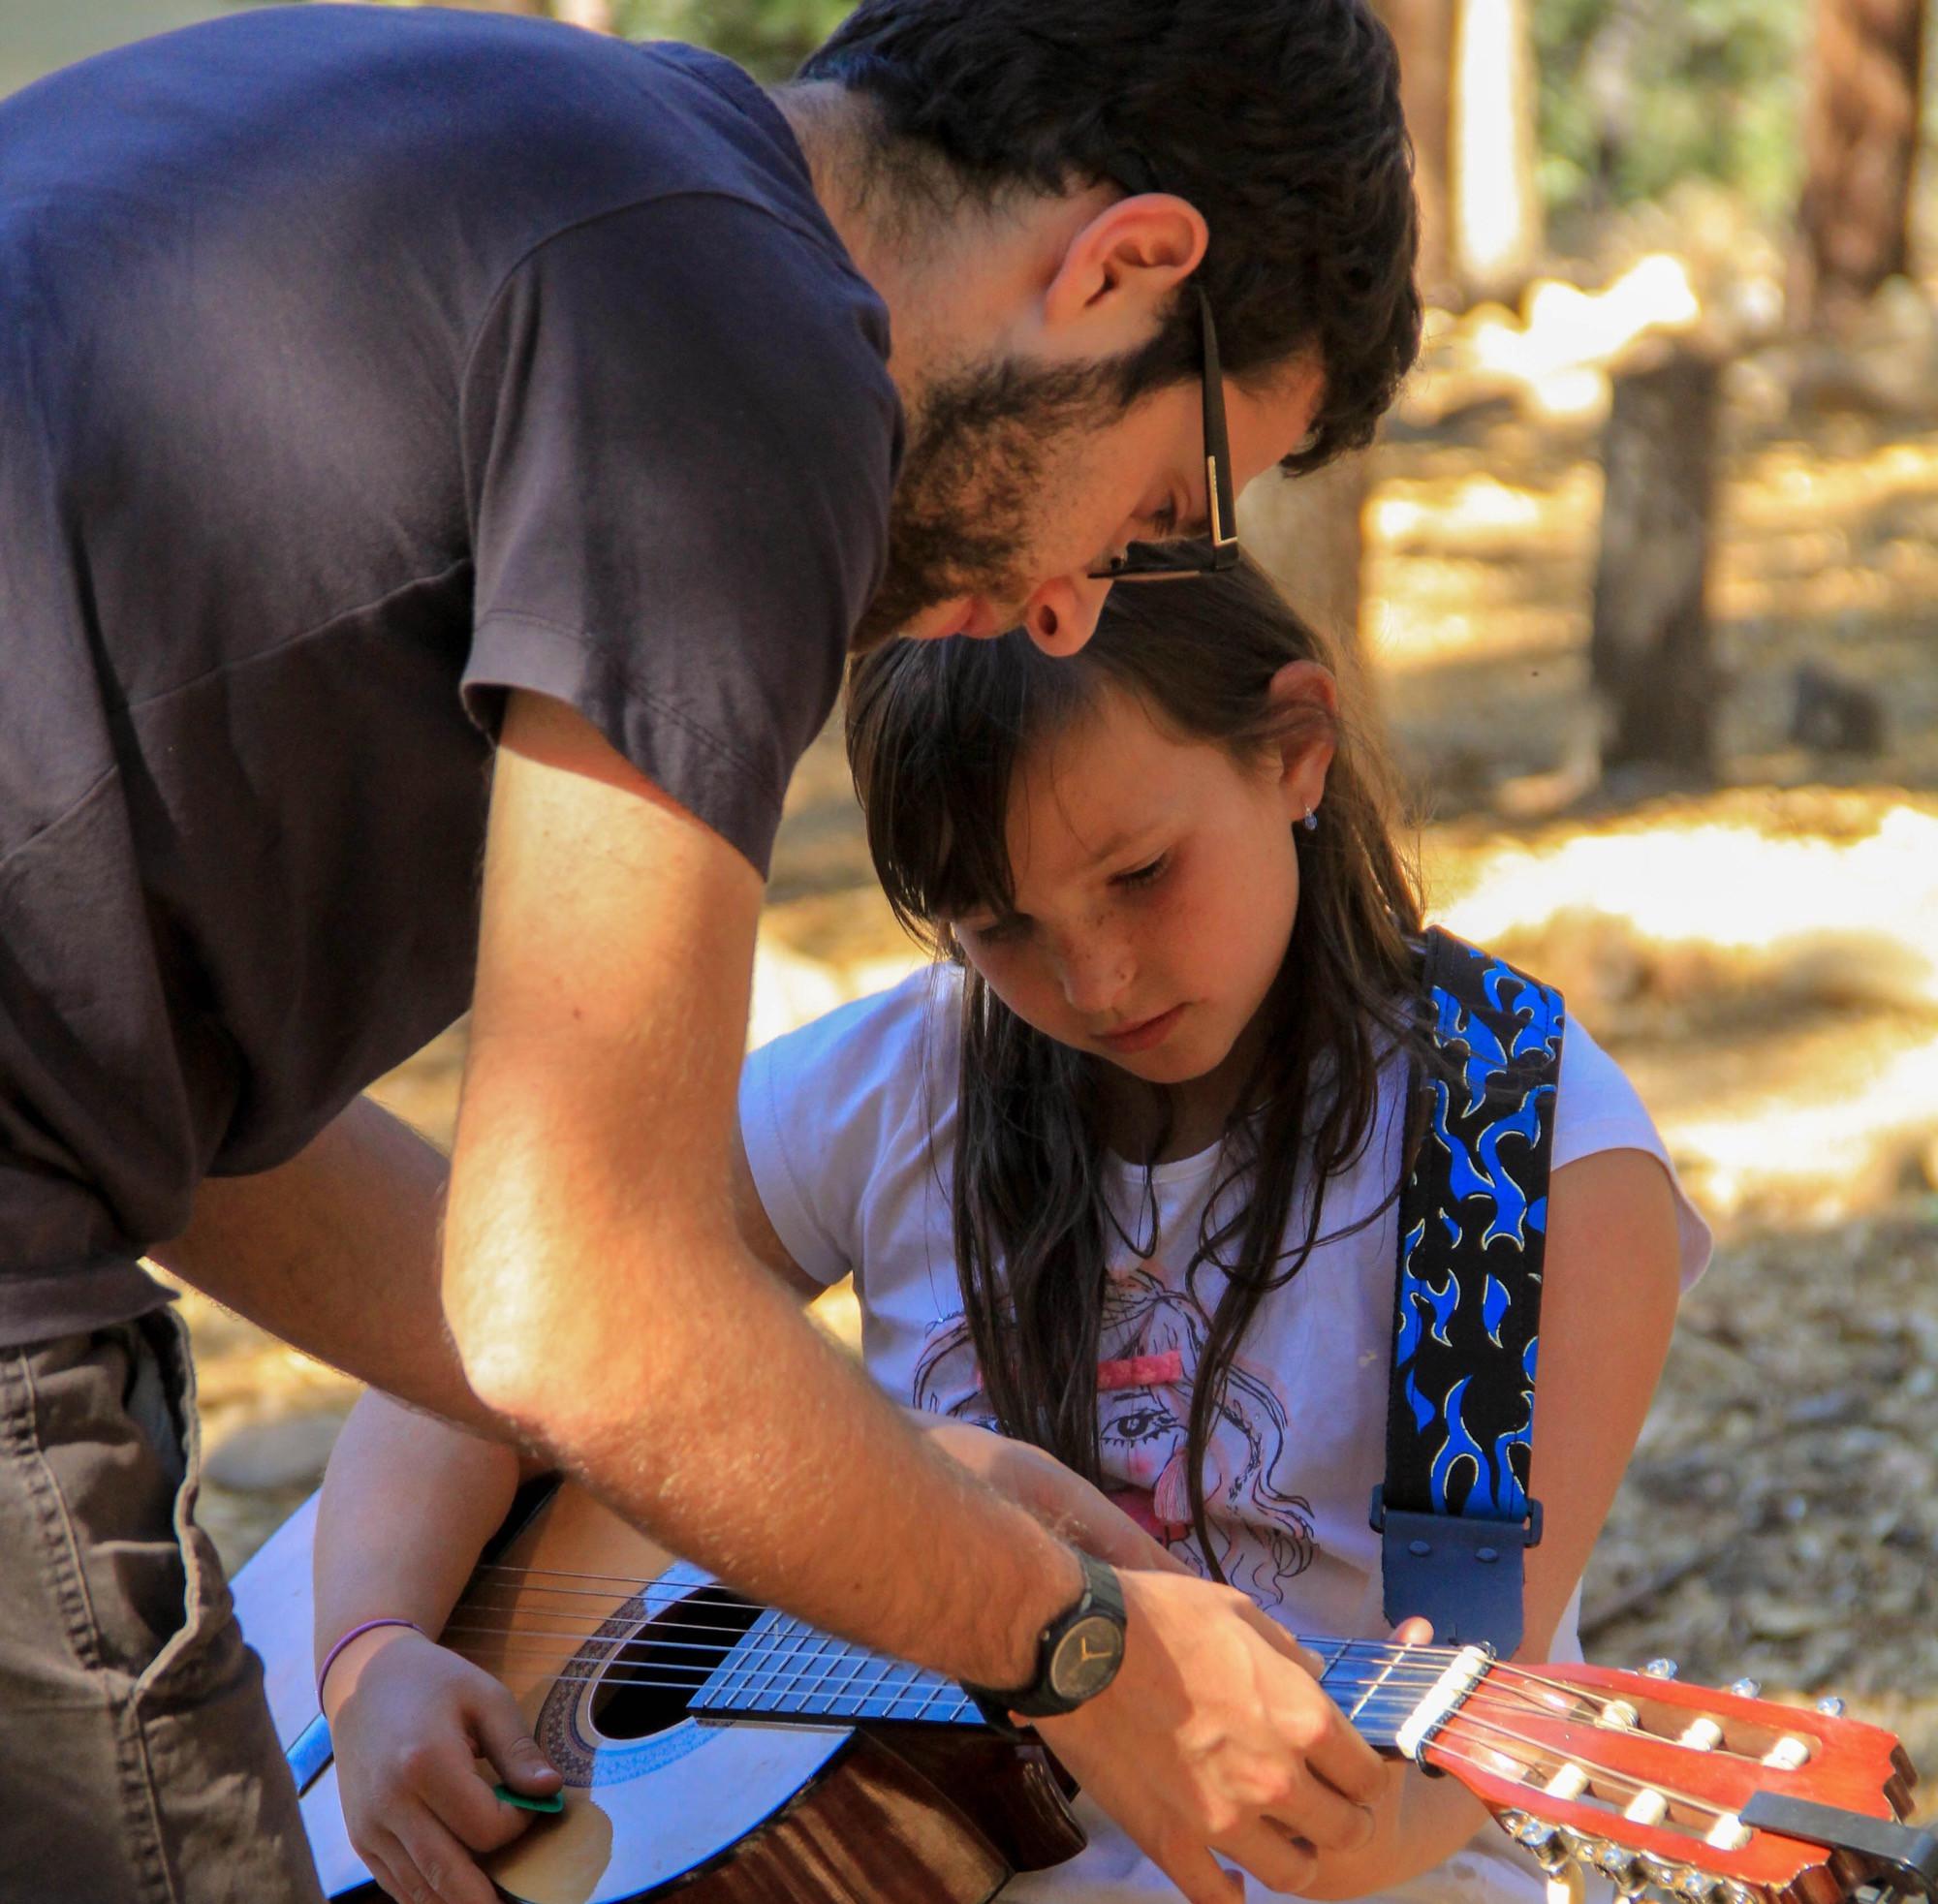 Folk Guitar/Music Lessons